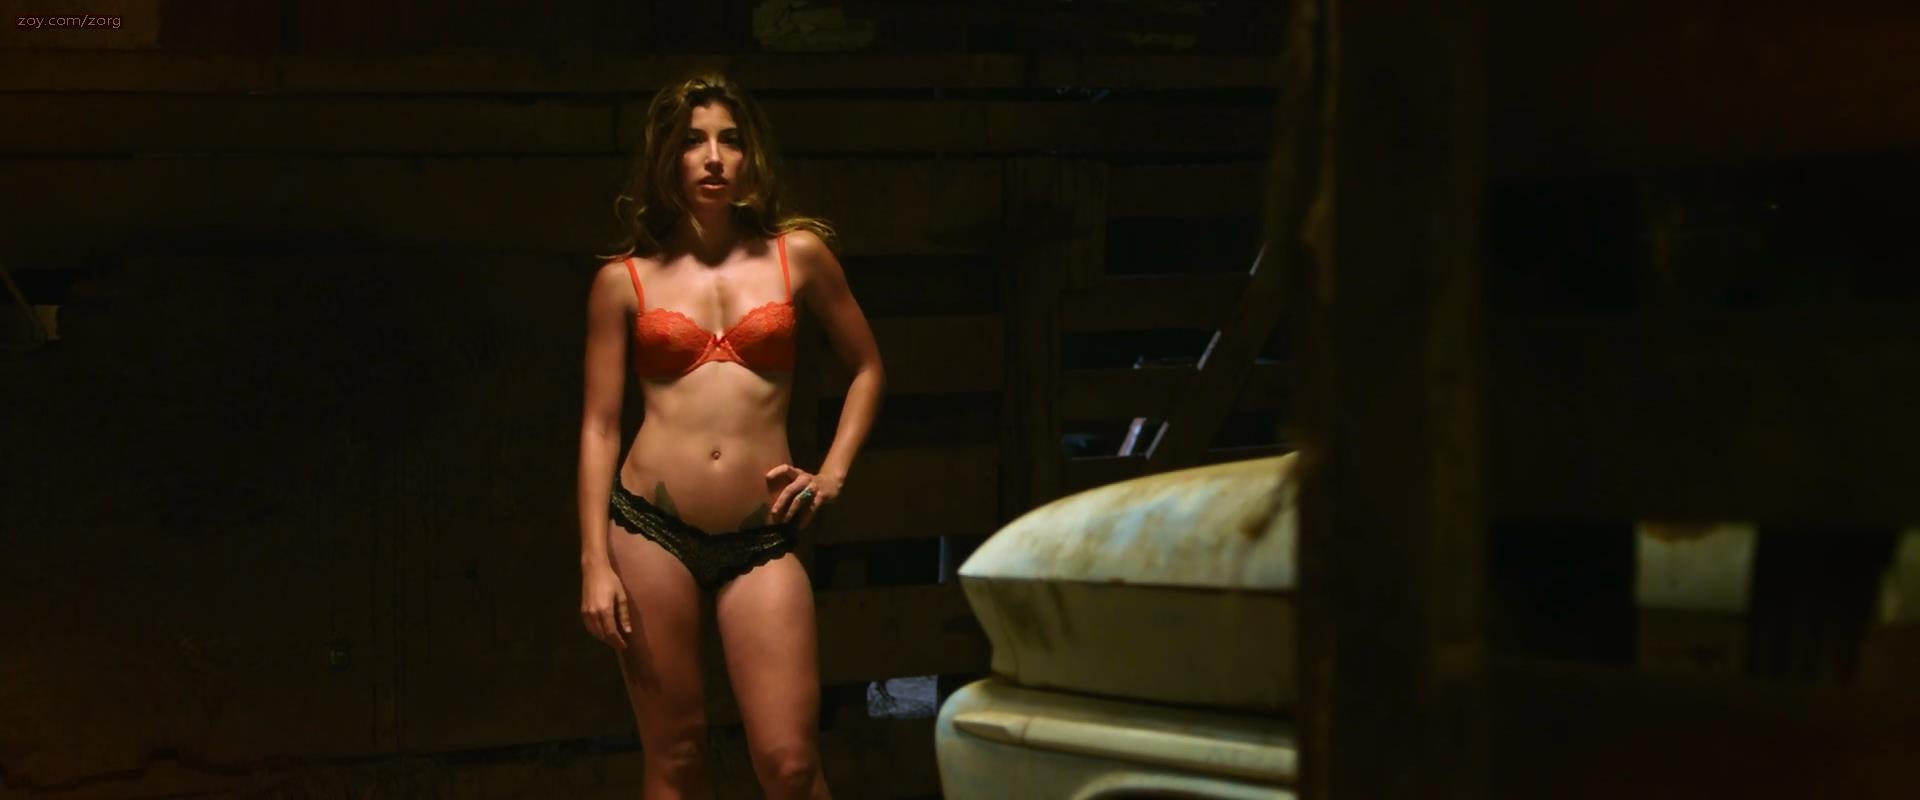 Tania Raymonde sexy lingerie - Texas Chainsaw 3D (2013) hd1080p